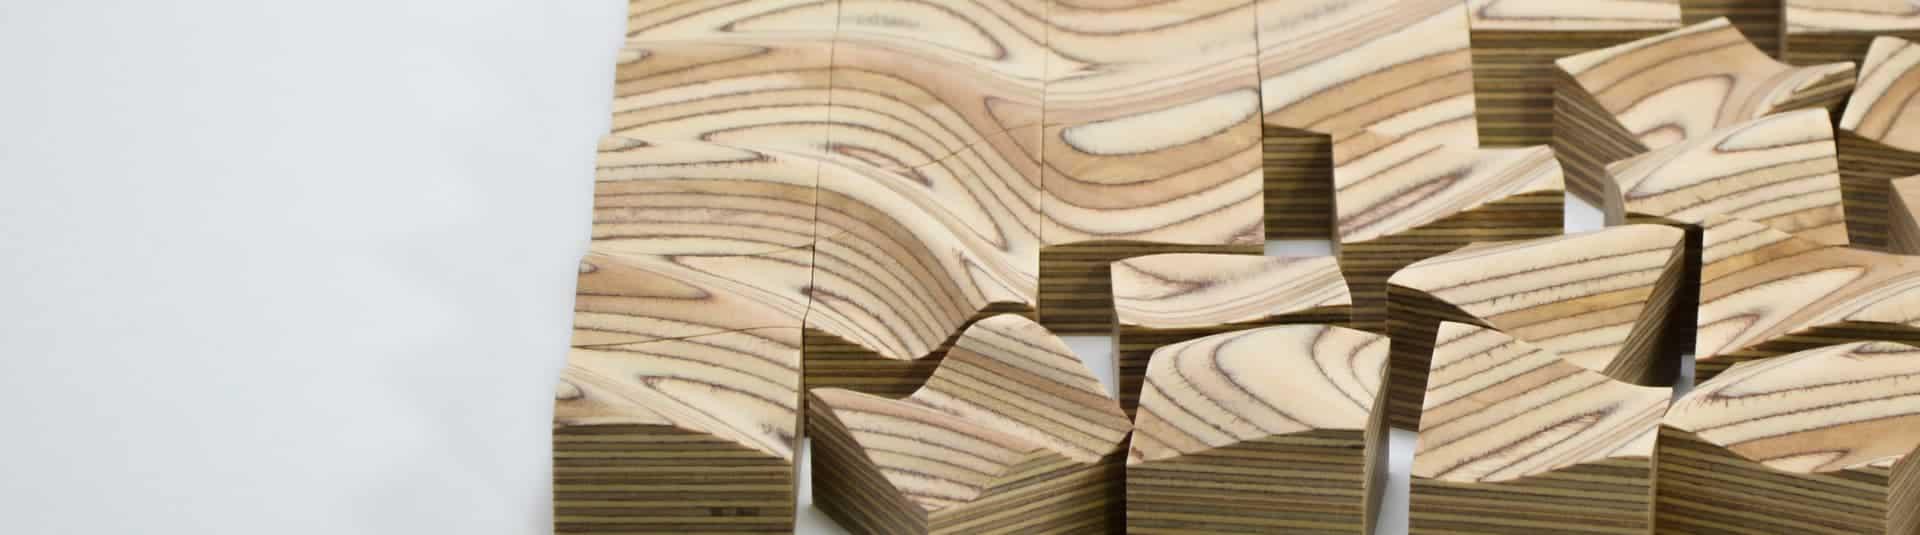 Strata | A sculptural wooden surface puzzle - Design Ideas